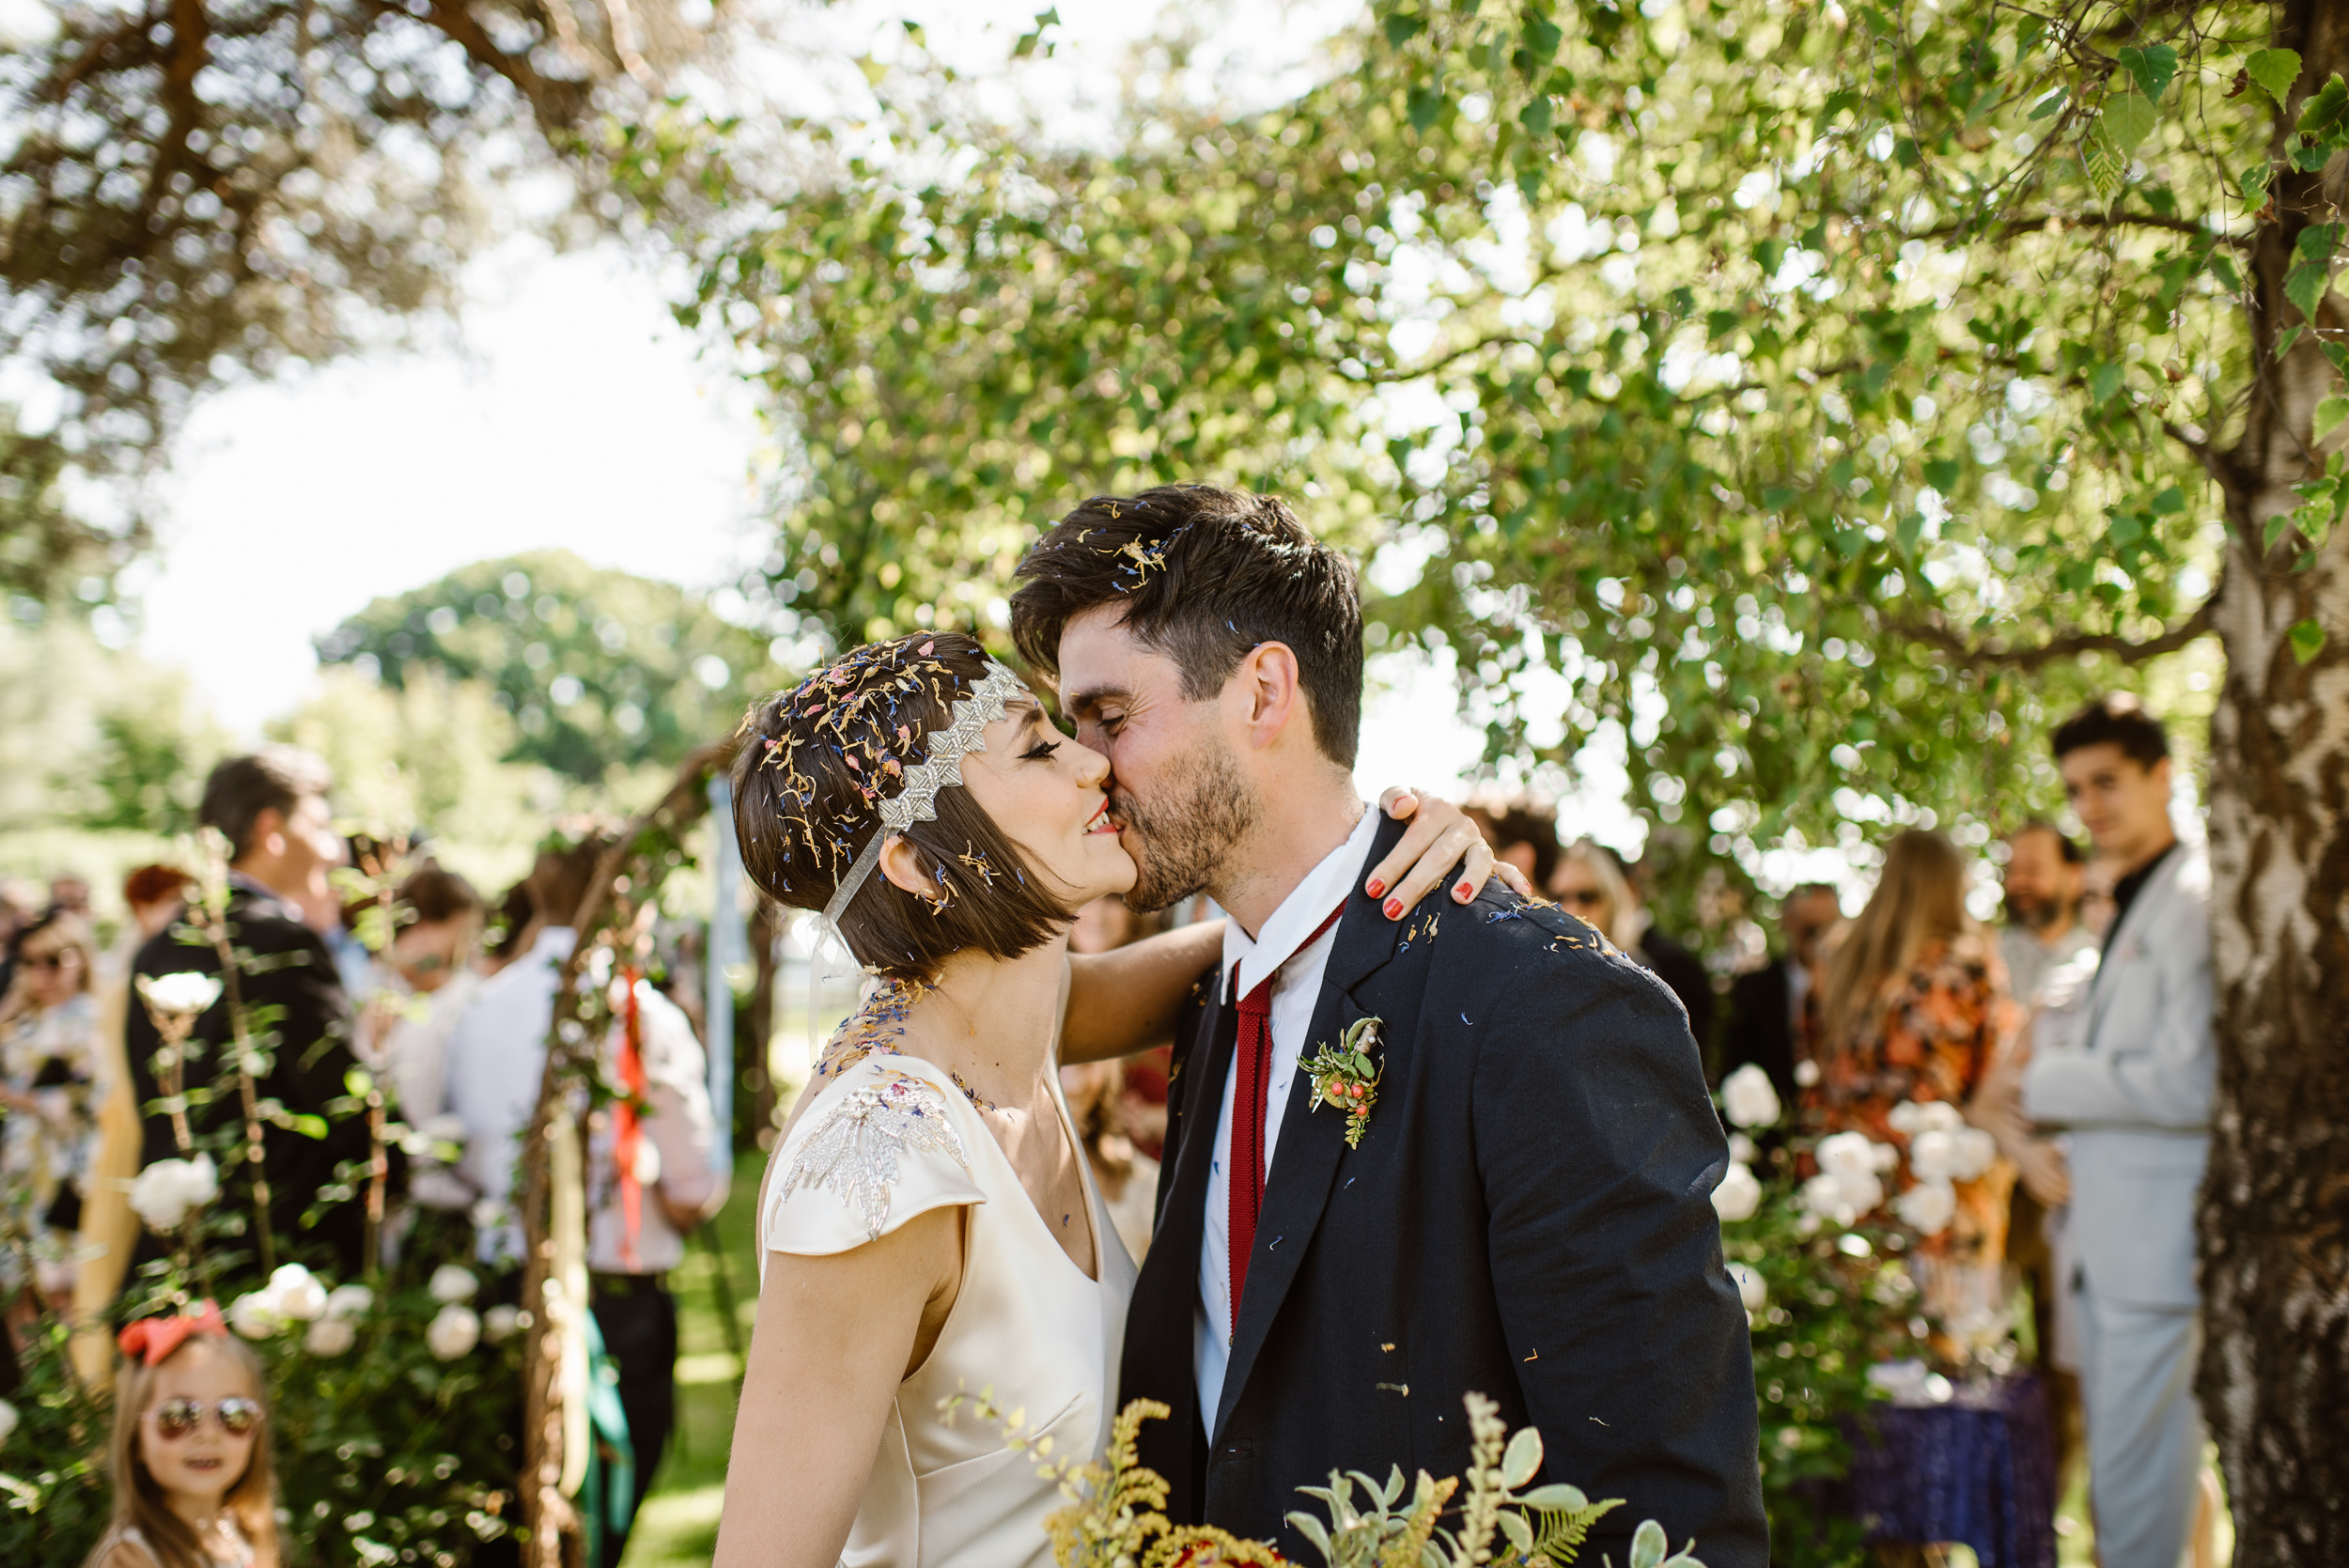 Ro-Kate-Beaumont-bias-cut-silk-wedding-gown-back-garden-wedding-by-Ellie-Gillard-12.jpg